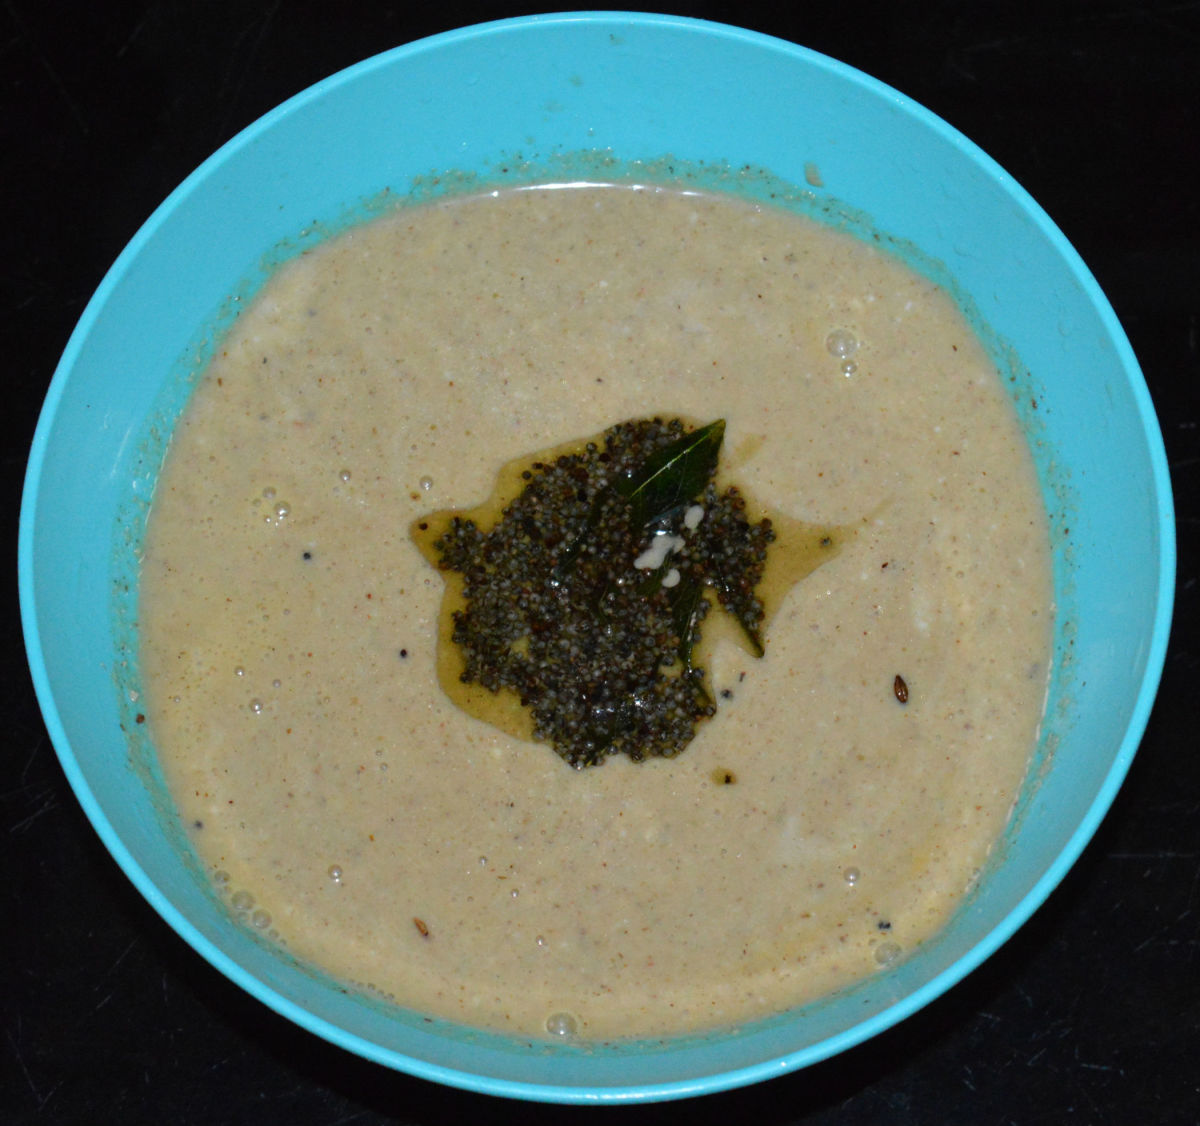 Uppinakai Tambuli (Pickled Mango Side Dish) Recipe